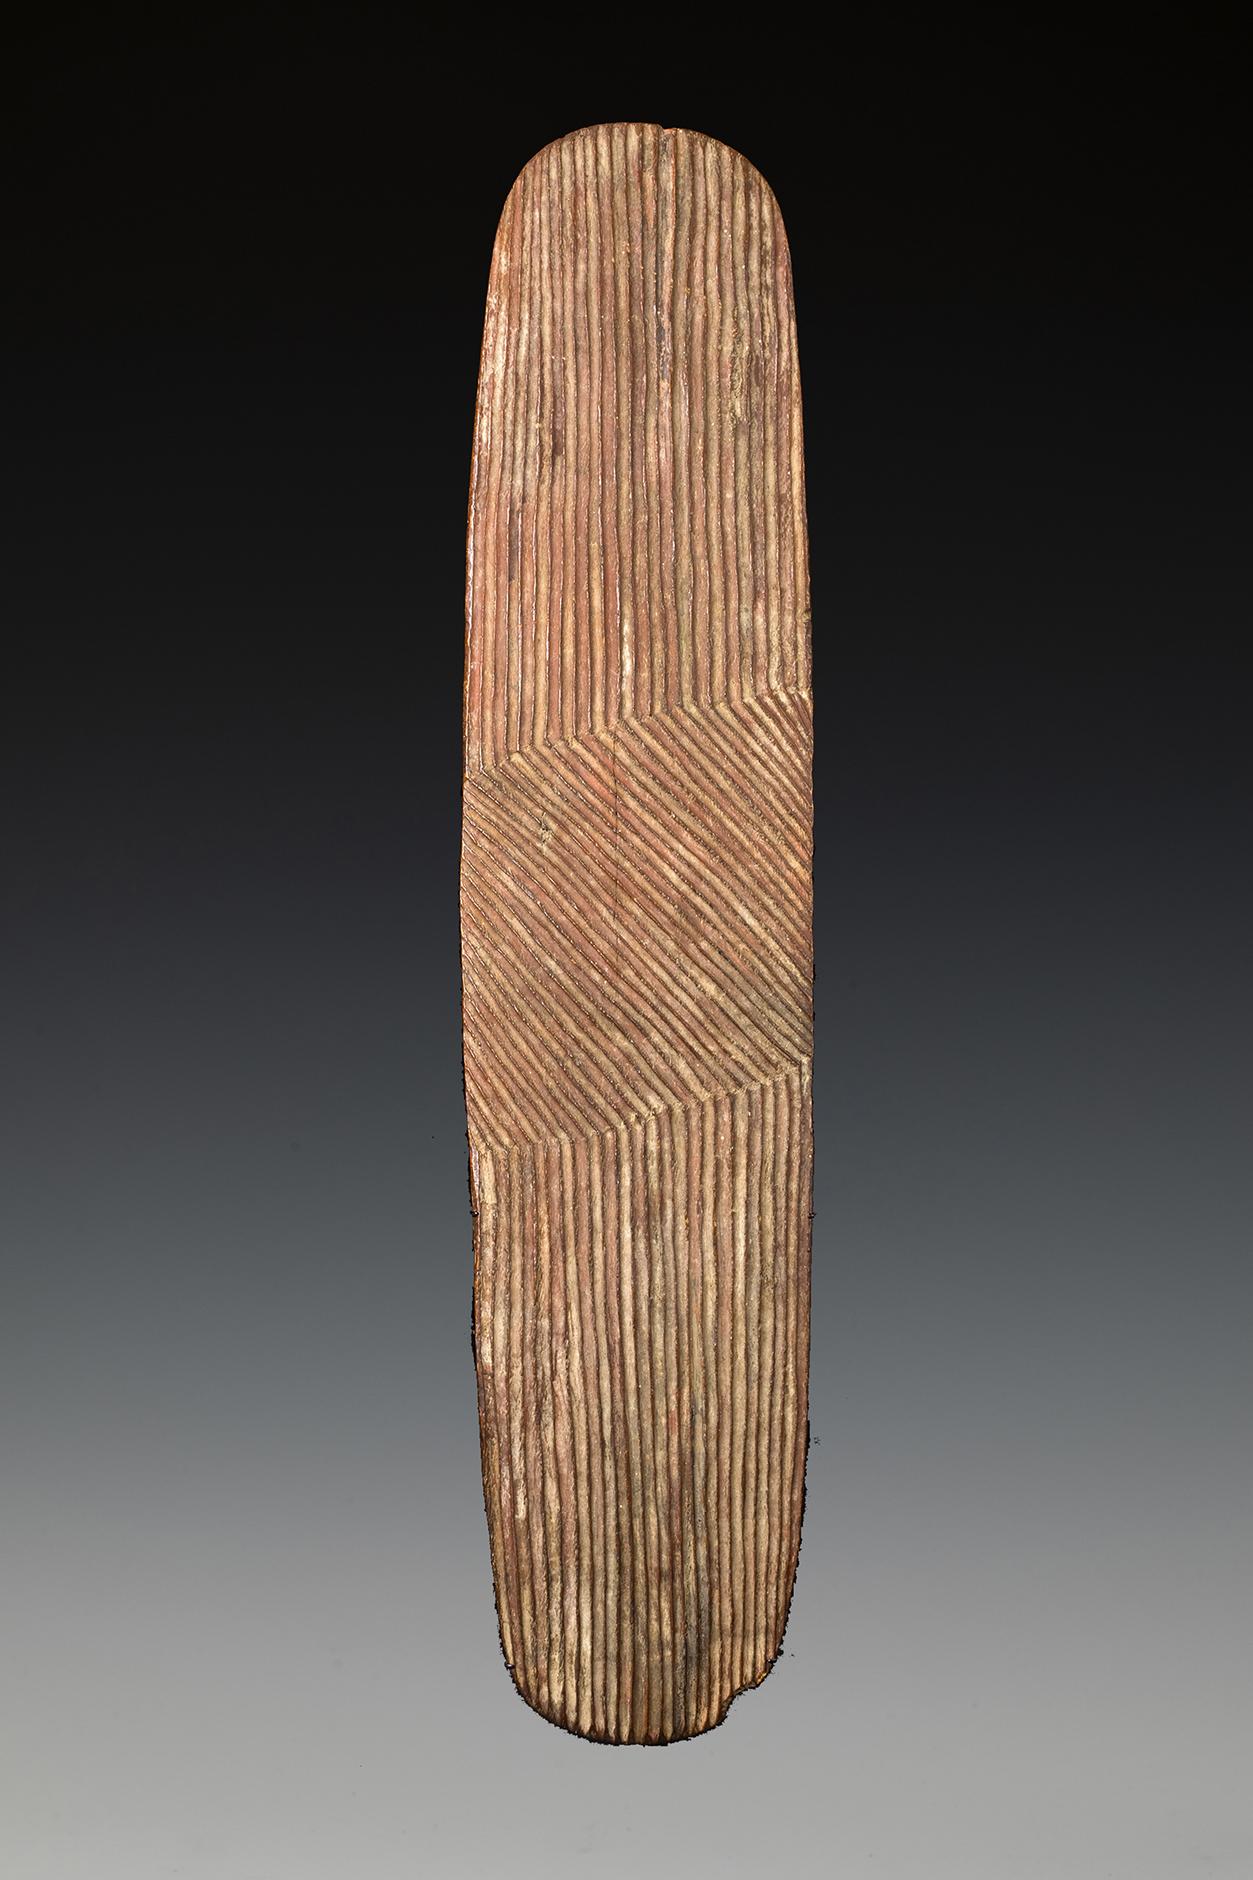 Wunda Shield, West Australia, 19th Century